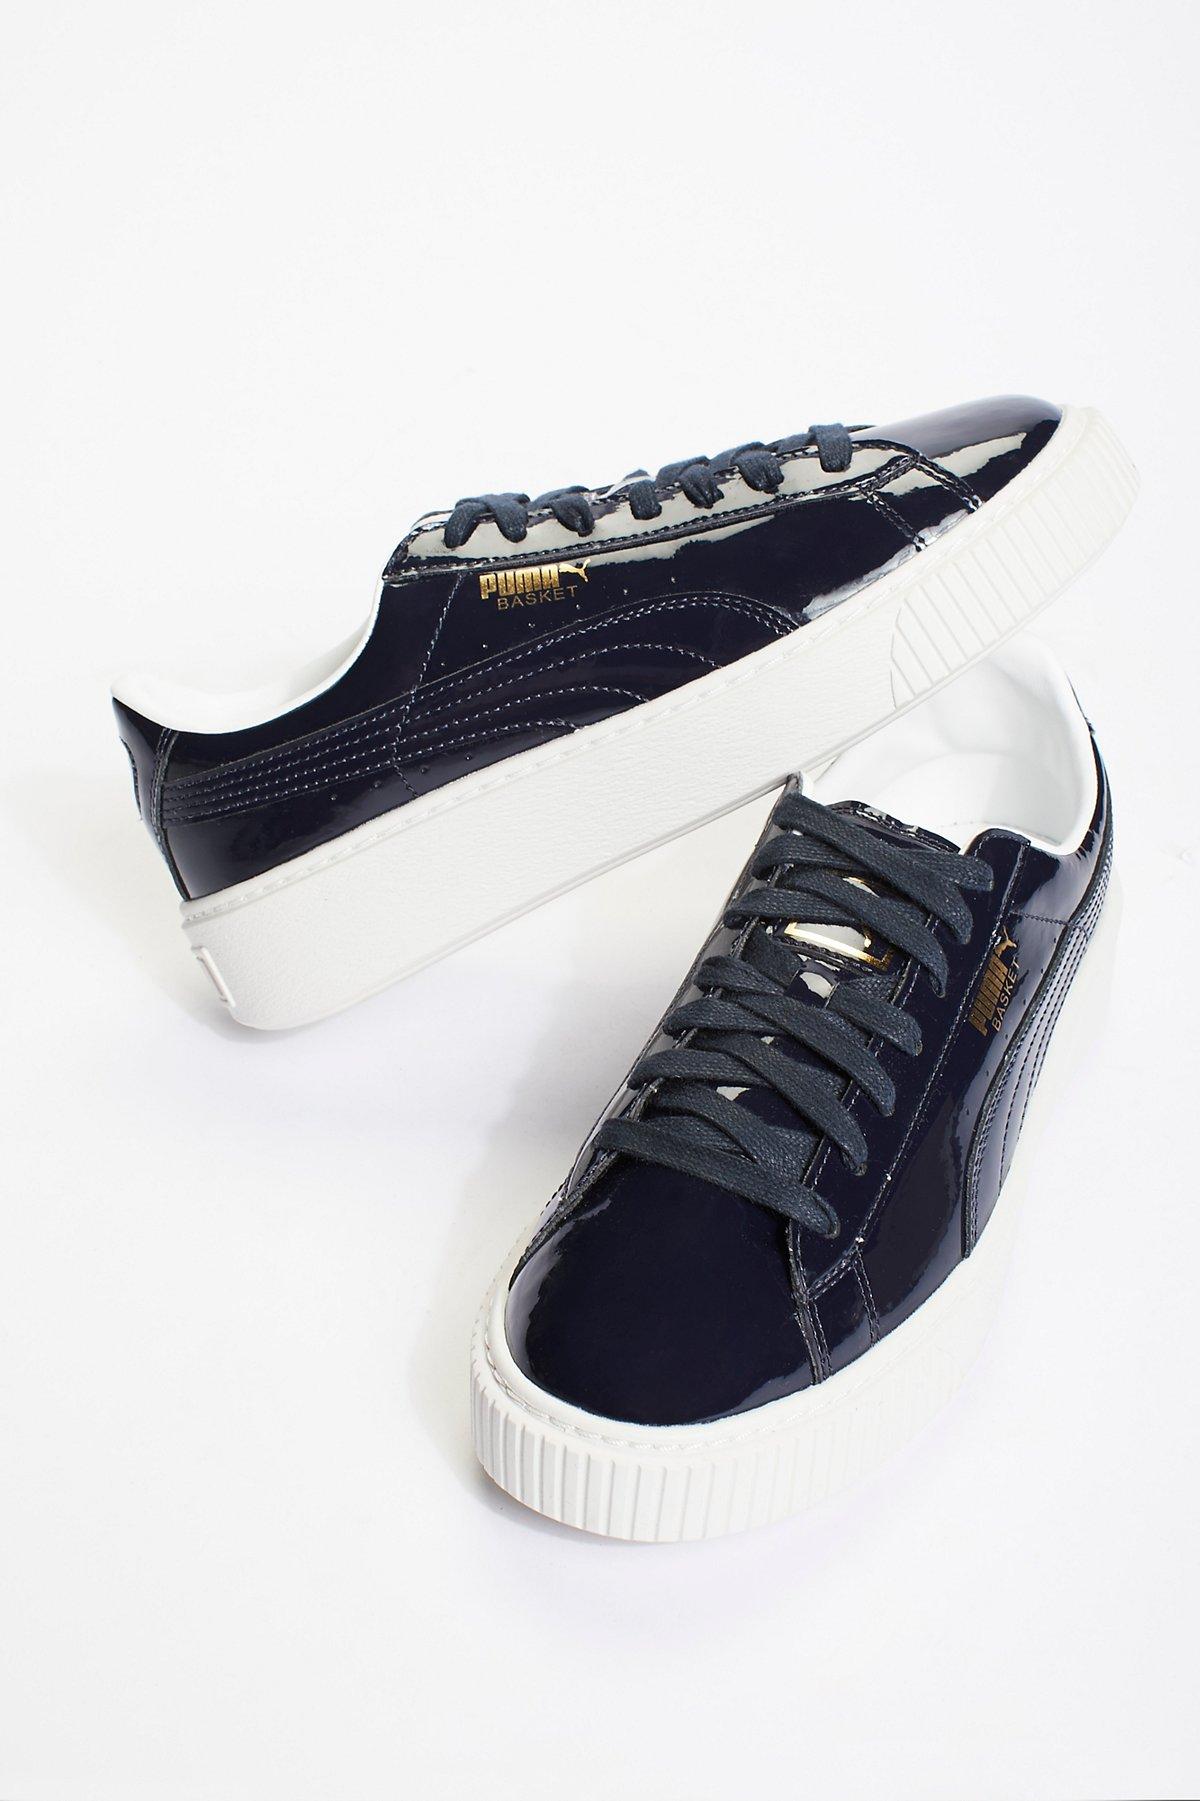 Basket厚底漆皮运动鞋